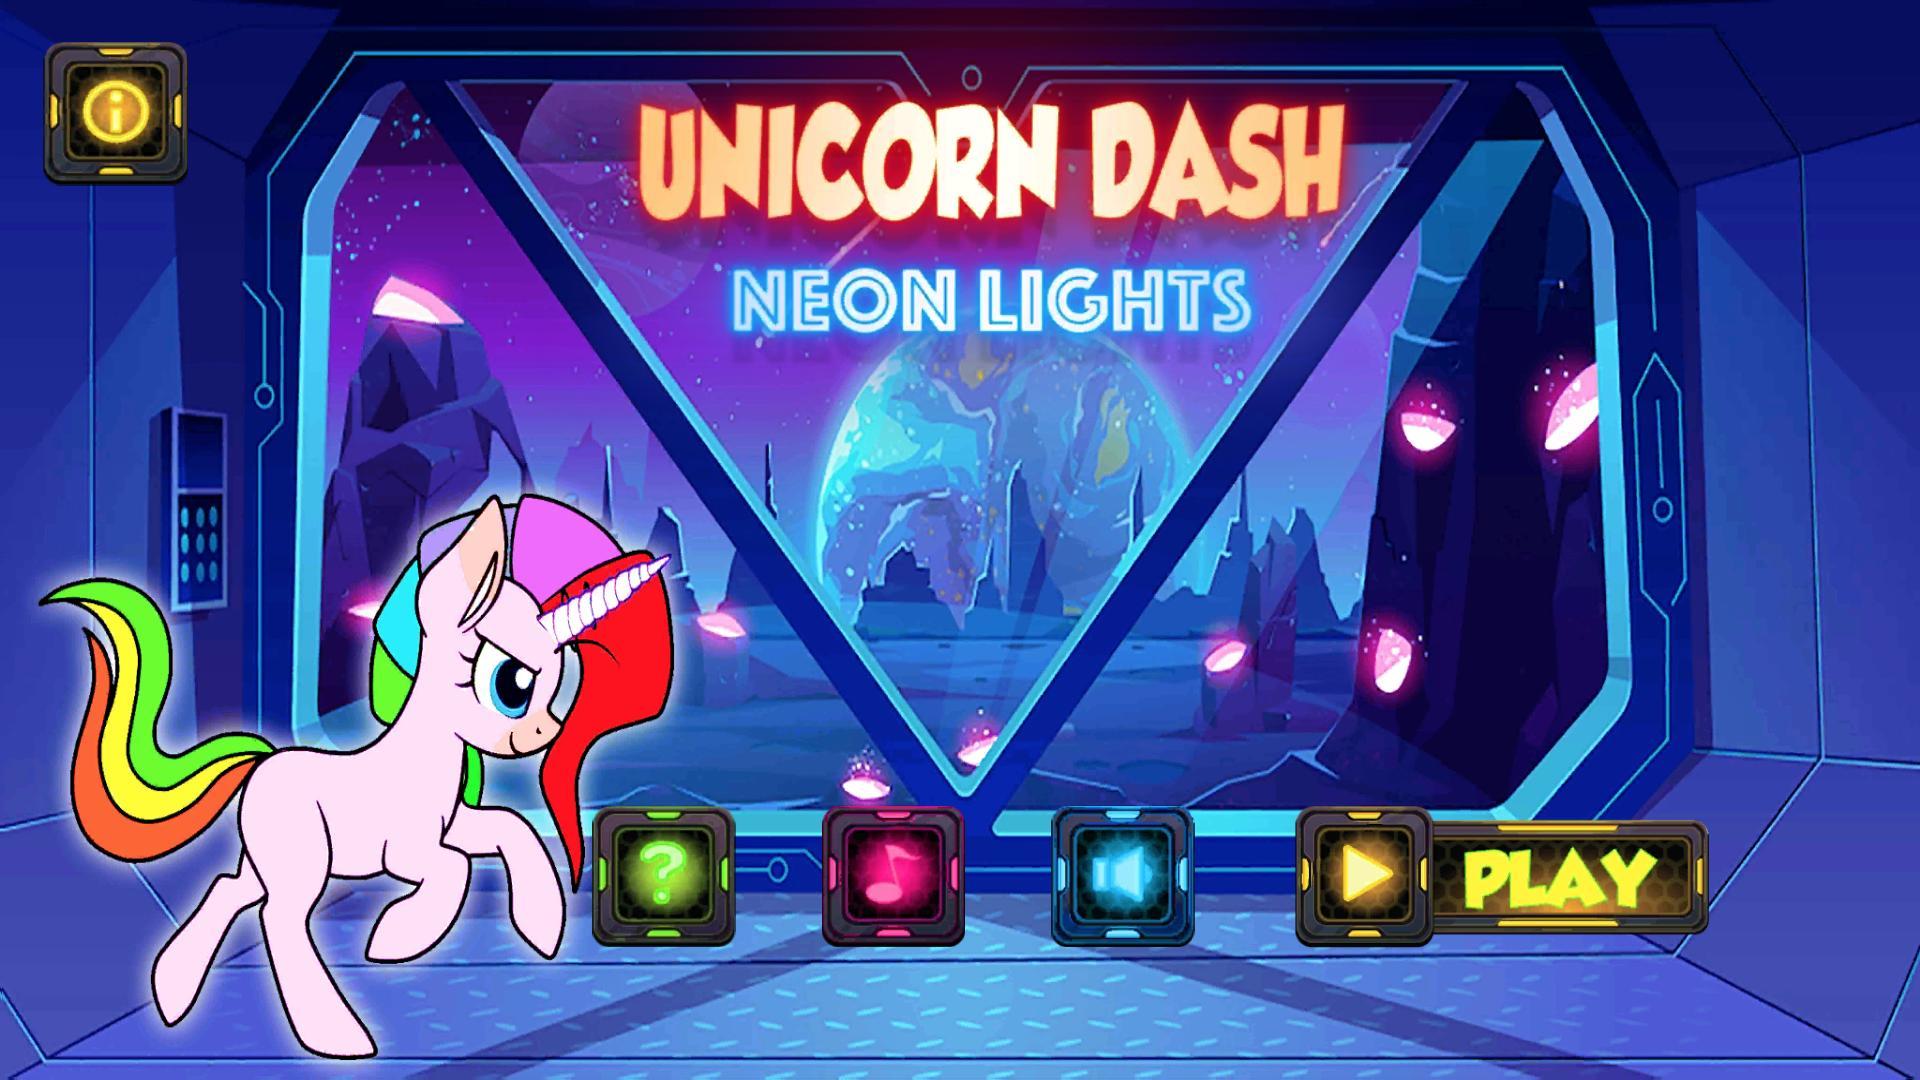 Unicorn Dash Neon Lights Unicorn Games mlp games 2.8.105 Screenshot 7